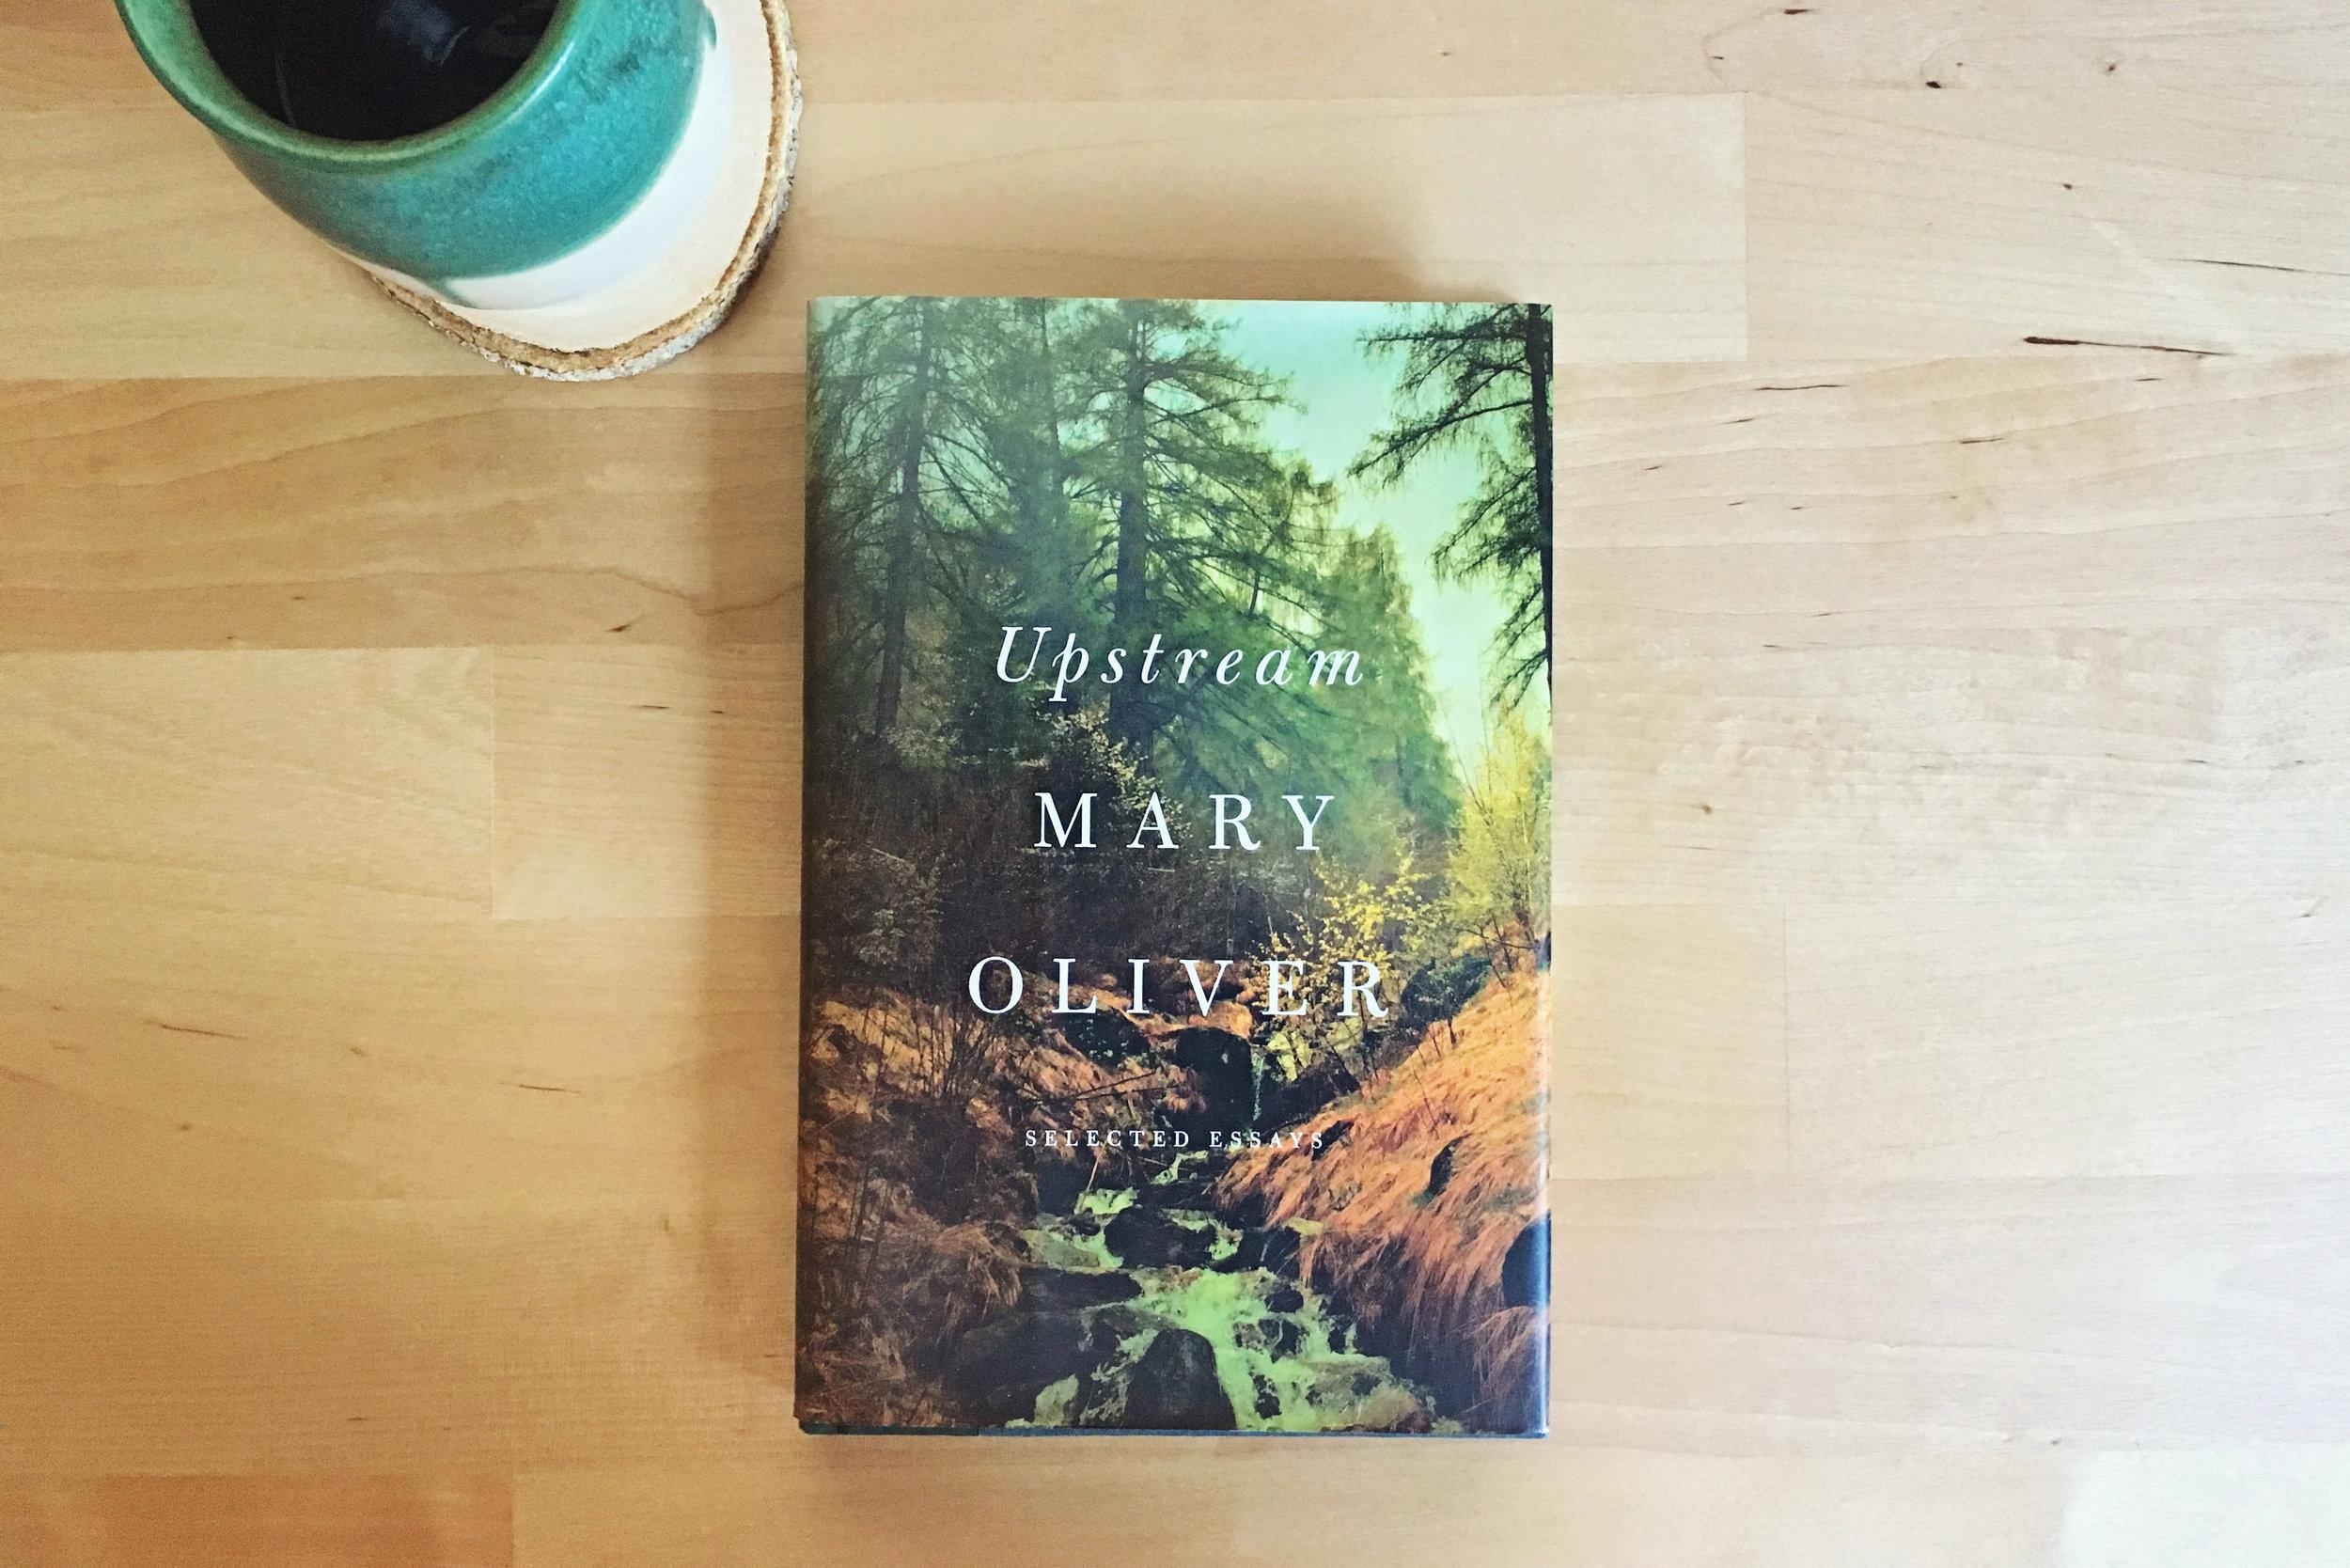 MaryOliver_Upstream_CindyGiovagnoli_bookclub2.JPG.JPG